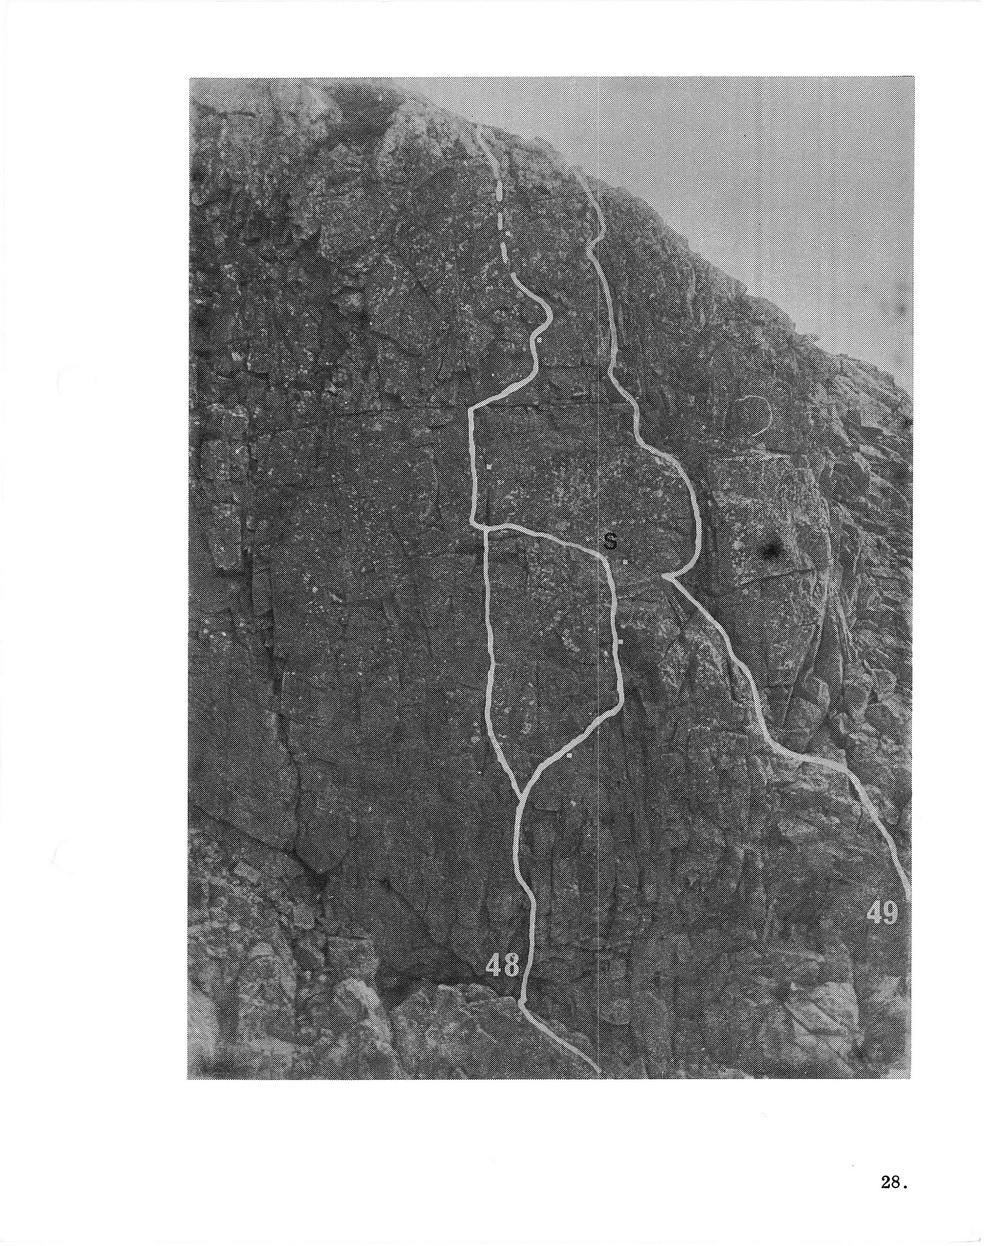 Kullen guide 1972 028.jpg